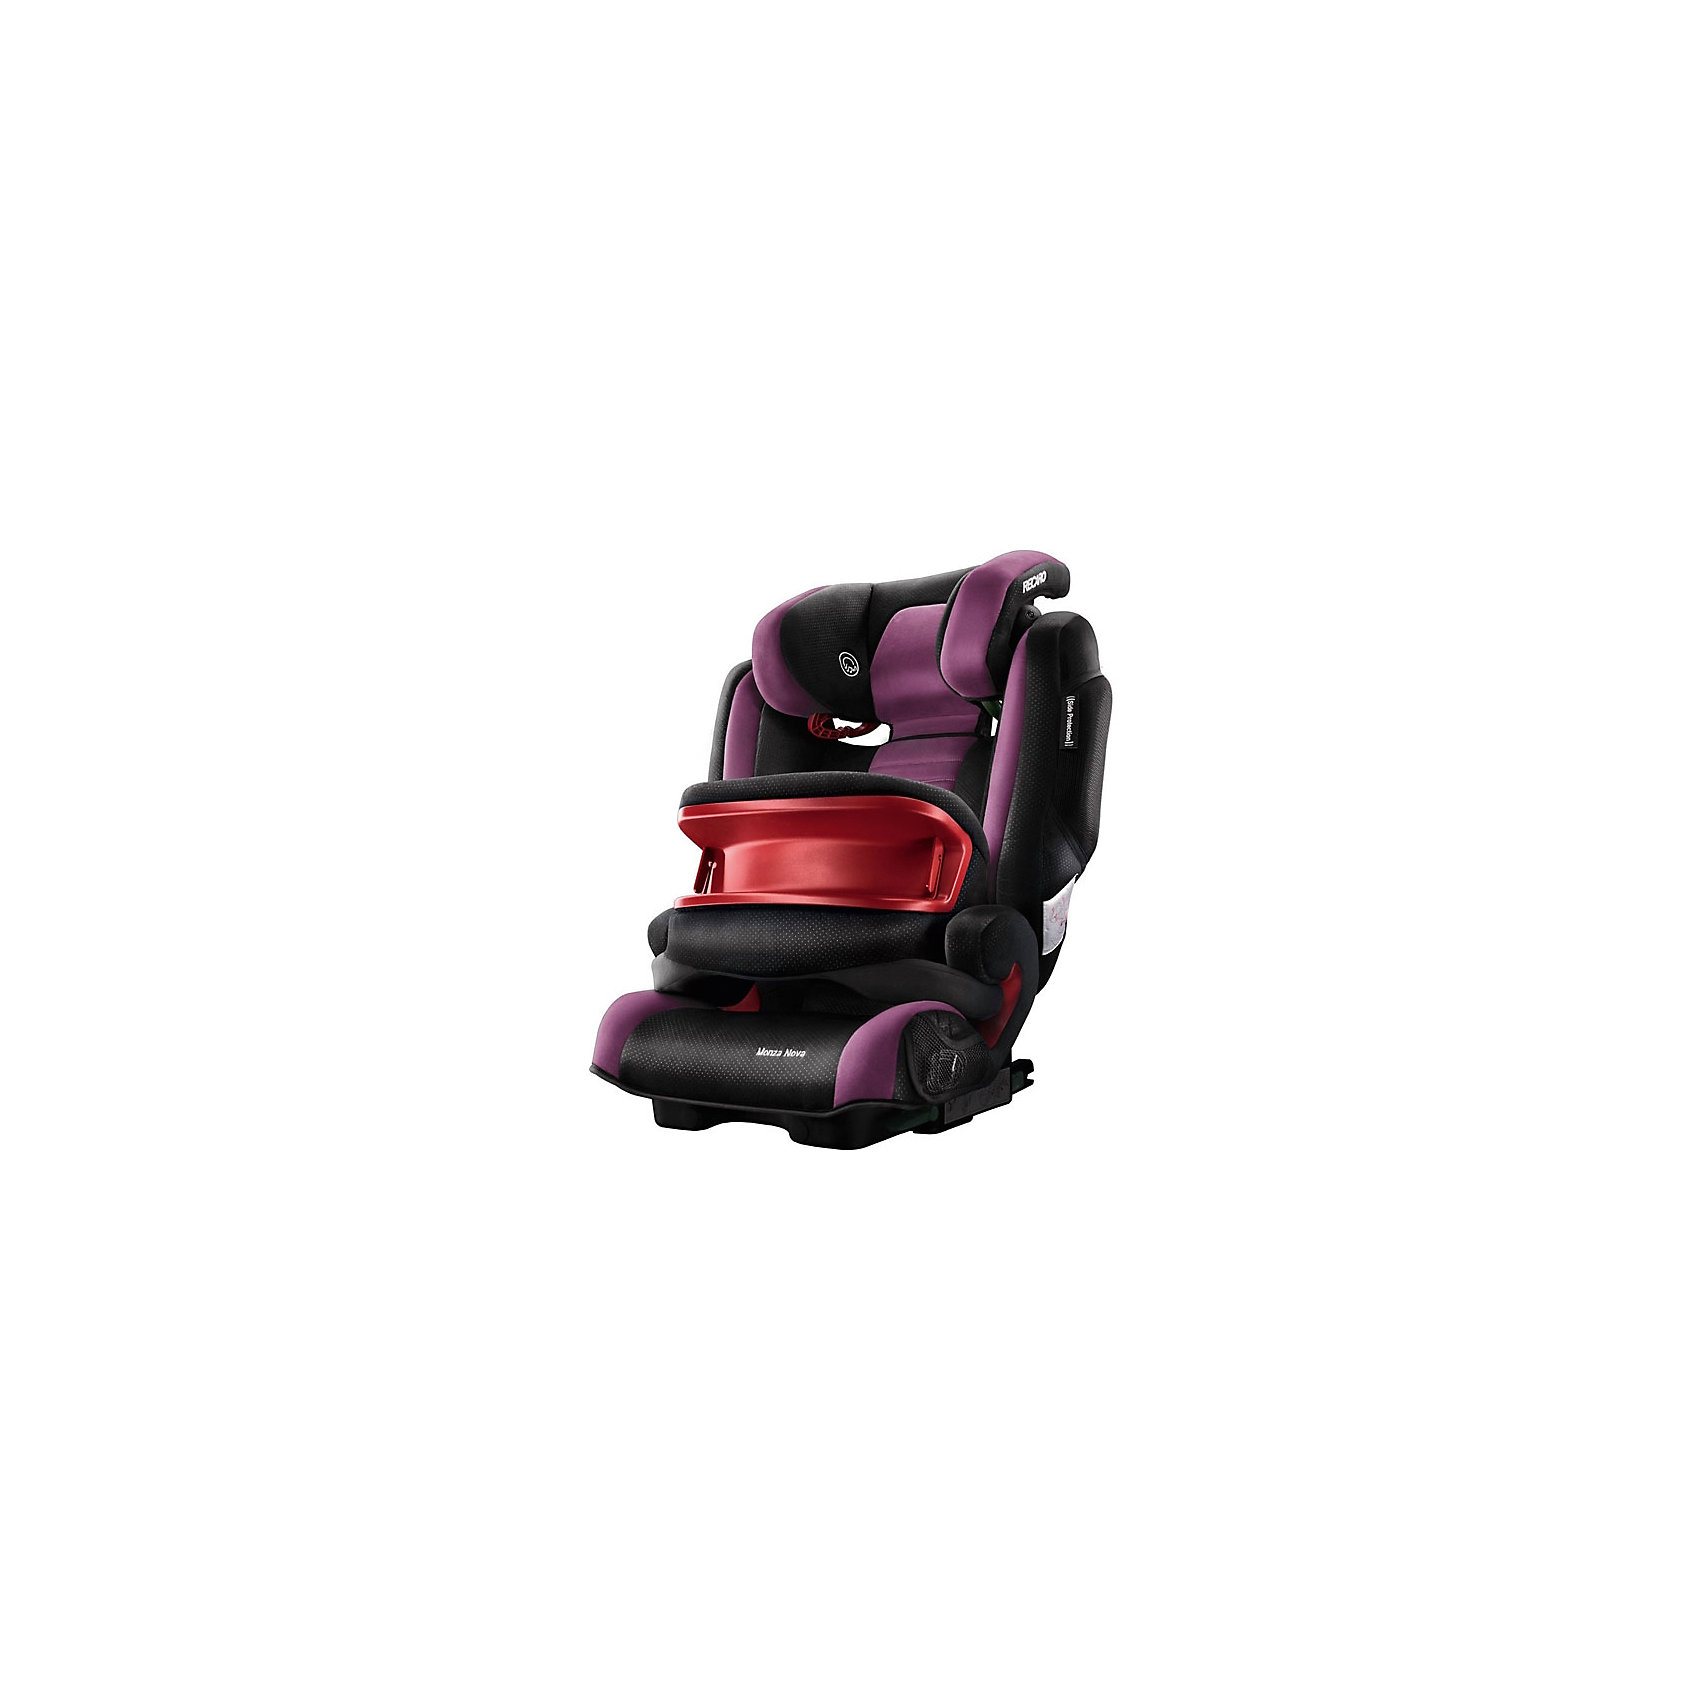 RECARO Автокресло Monza Nova IS SF,  9-36 кг, Recaro, violet защитные стекла и пленки interstep is sf 7uhtc0ctr 000b201